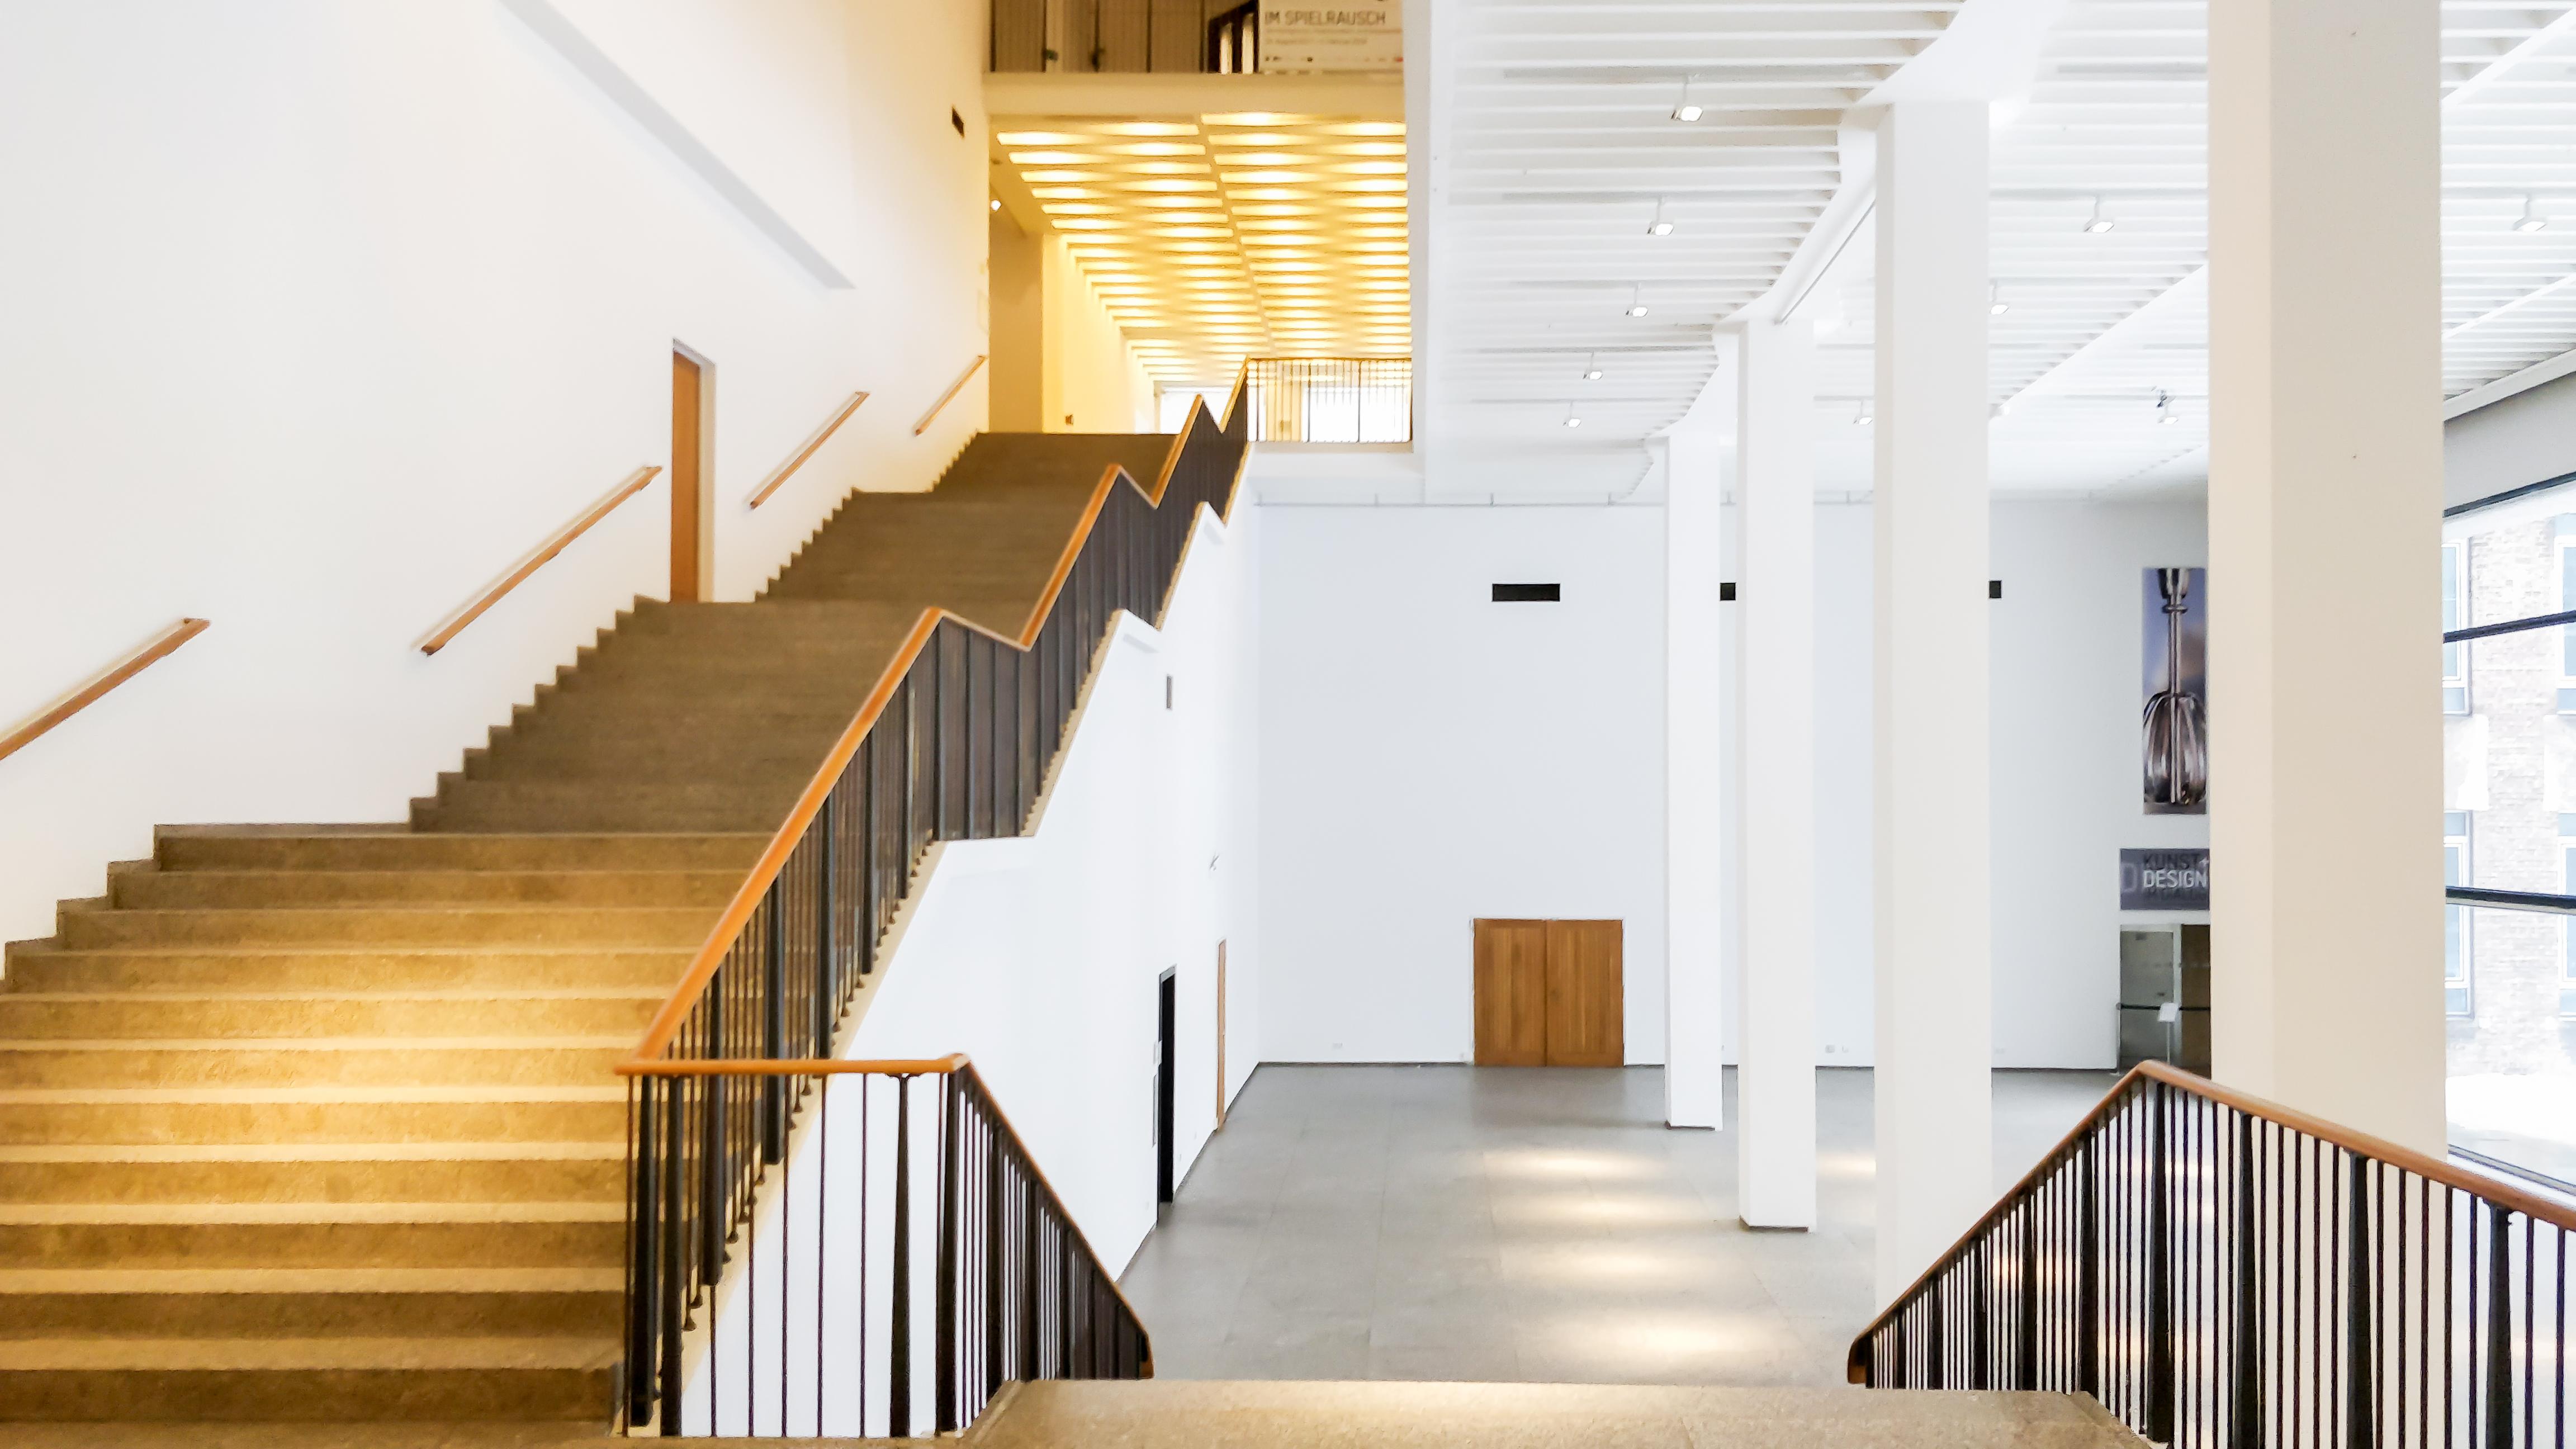 Museum für Angewandte Kunst (MAKK), Keulen. Foto met dank aan Raimond Spekking, CC BY-SA 4.0